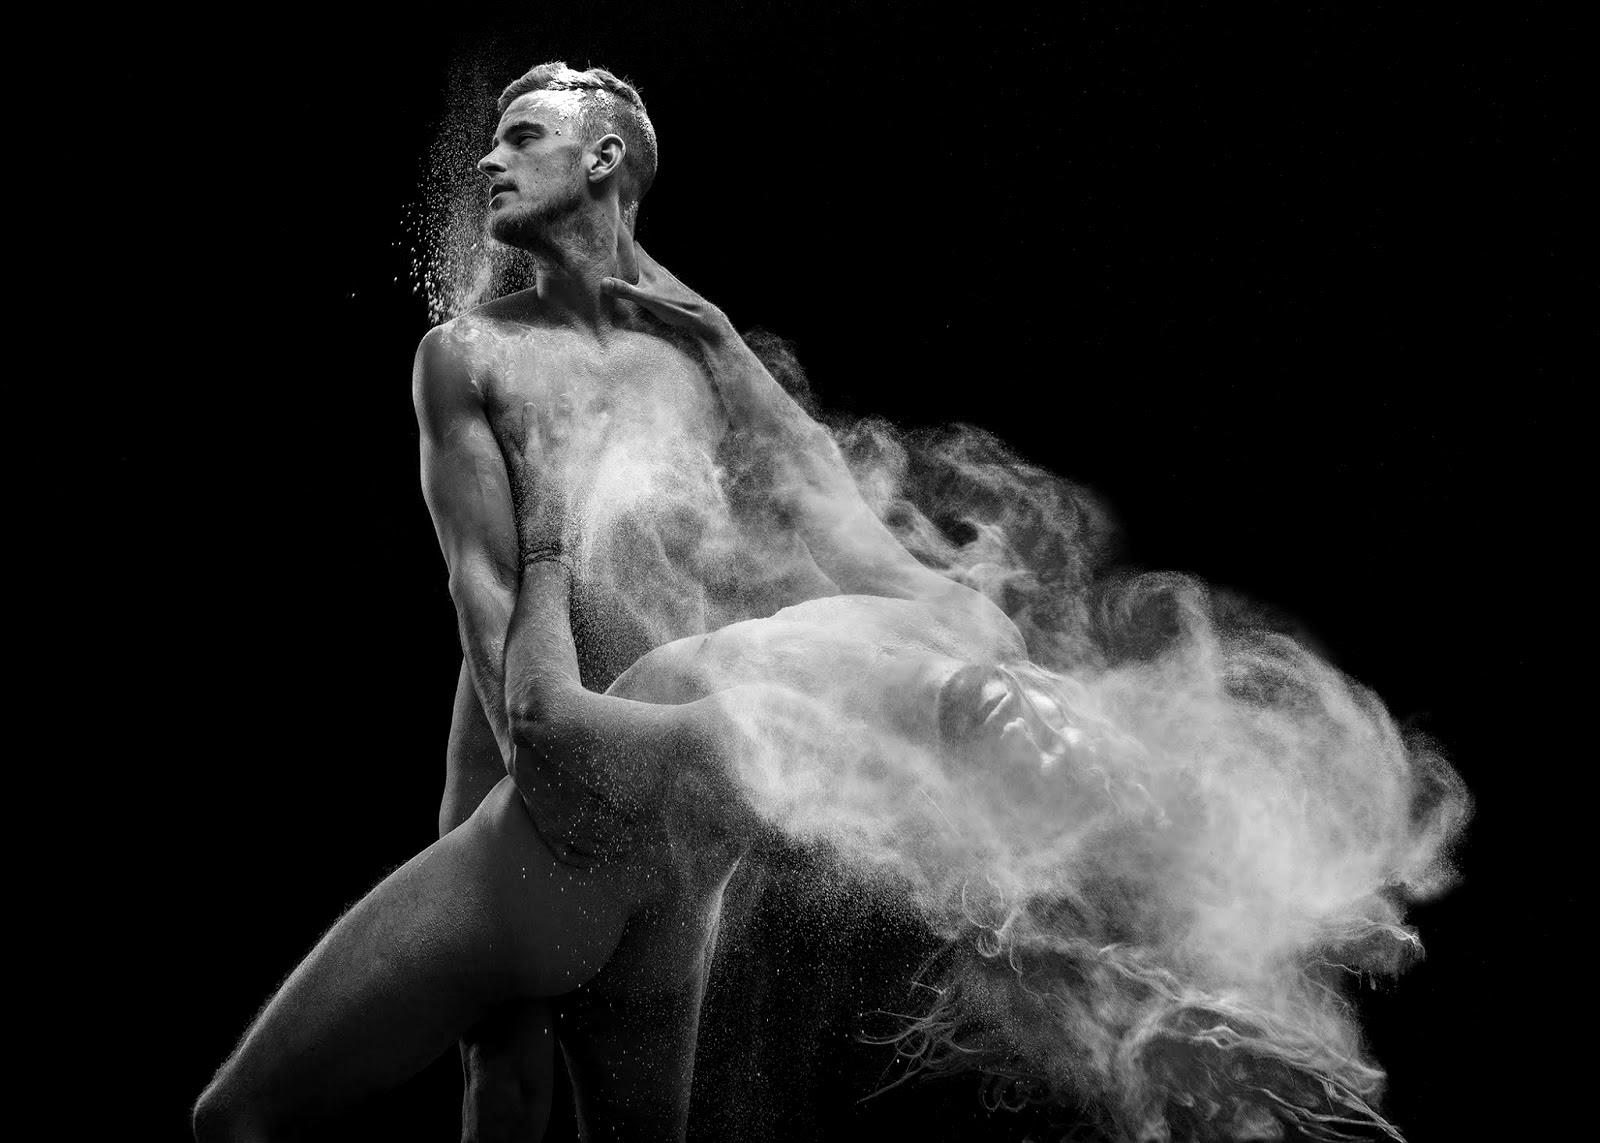 MagiC, by Hannes Van Der Merwe ft Adam Wilder & Simon Tuit